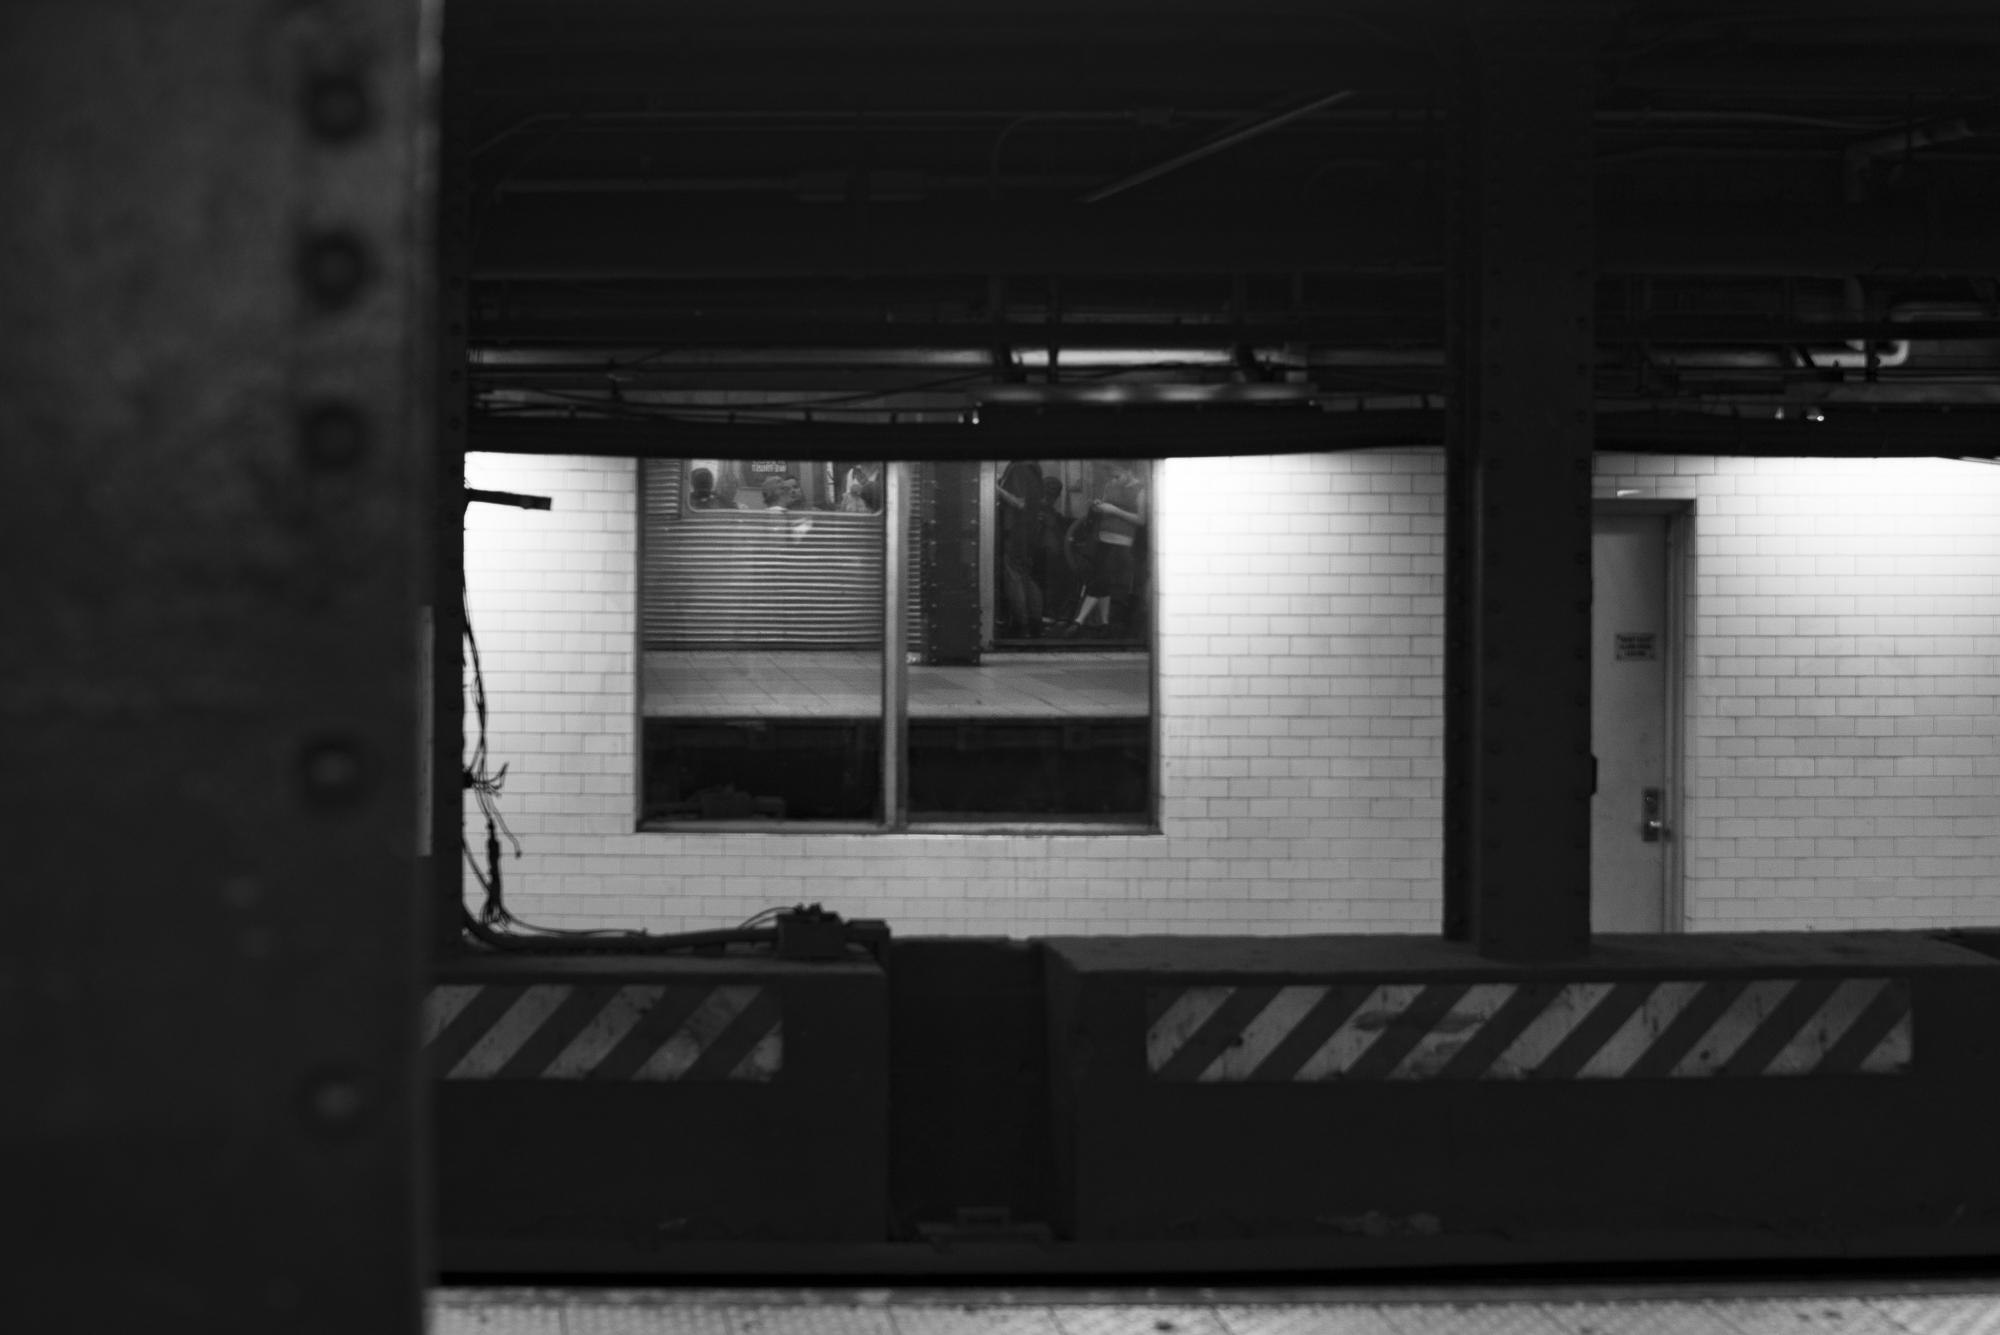 Lormier St. Brooklyn, N.Y